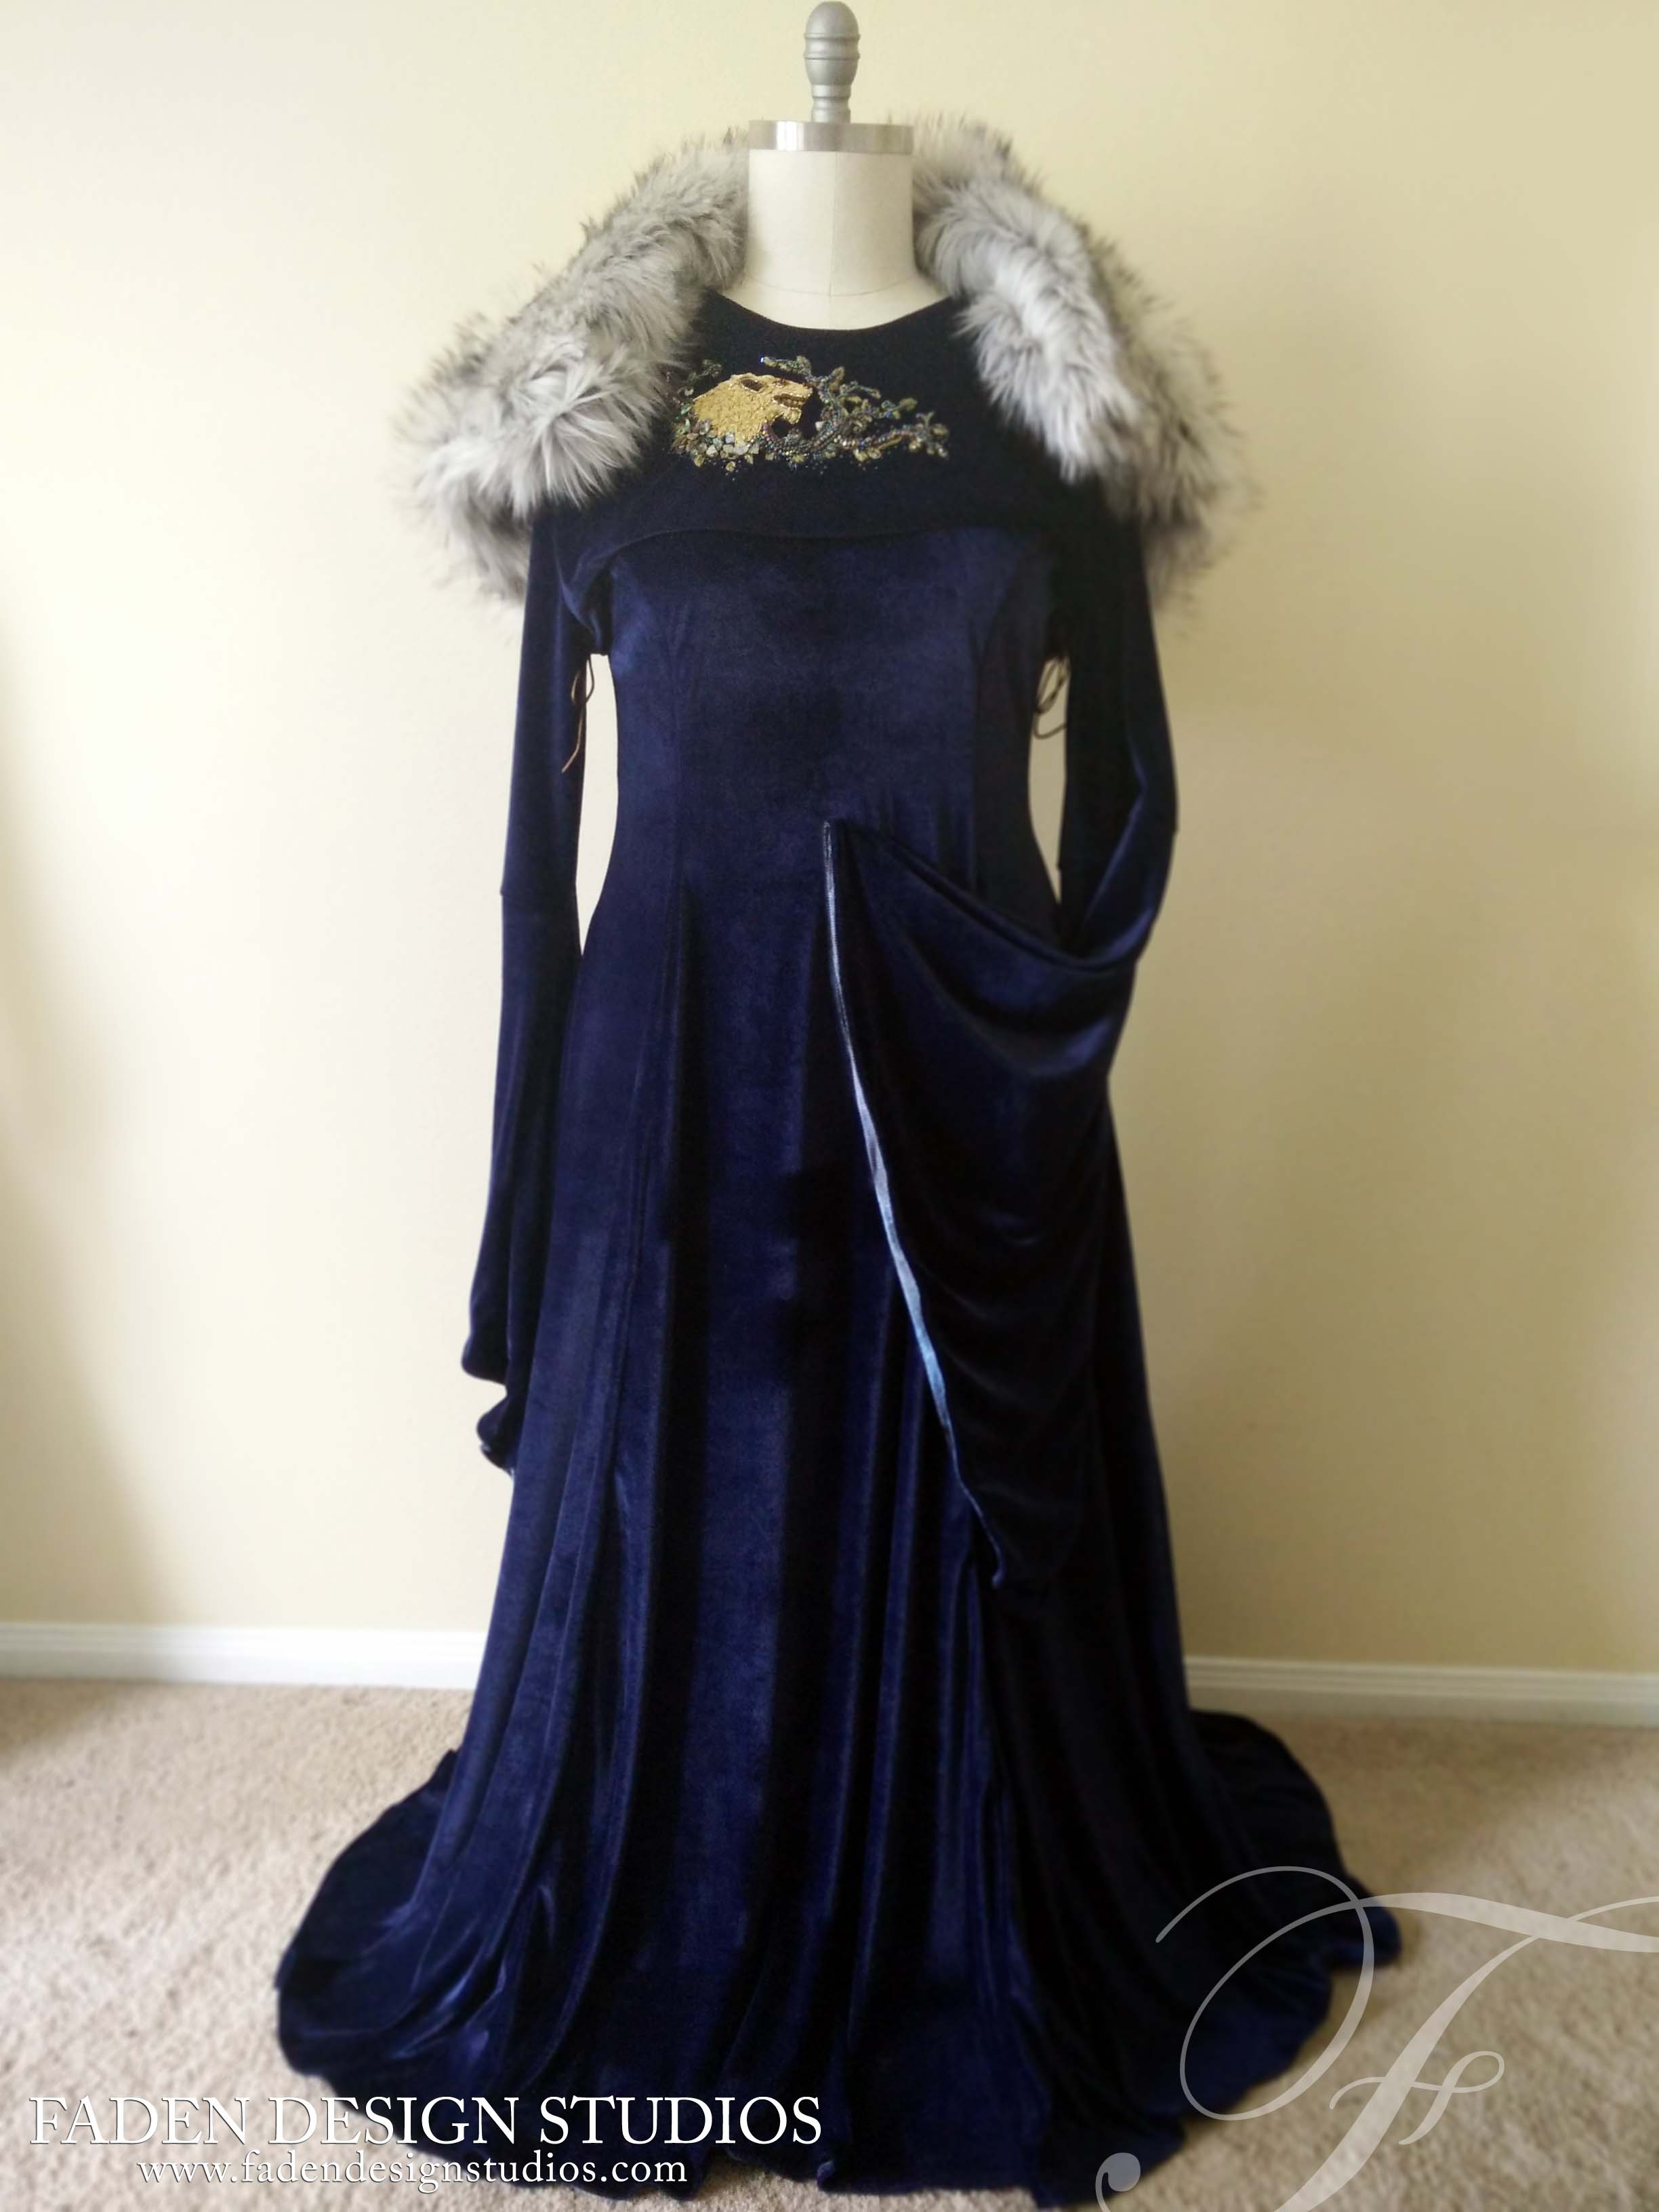 Sansa Stark Direwolf Gown With Intricate Beading